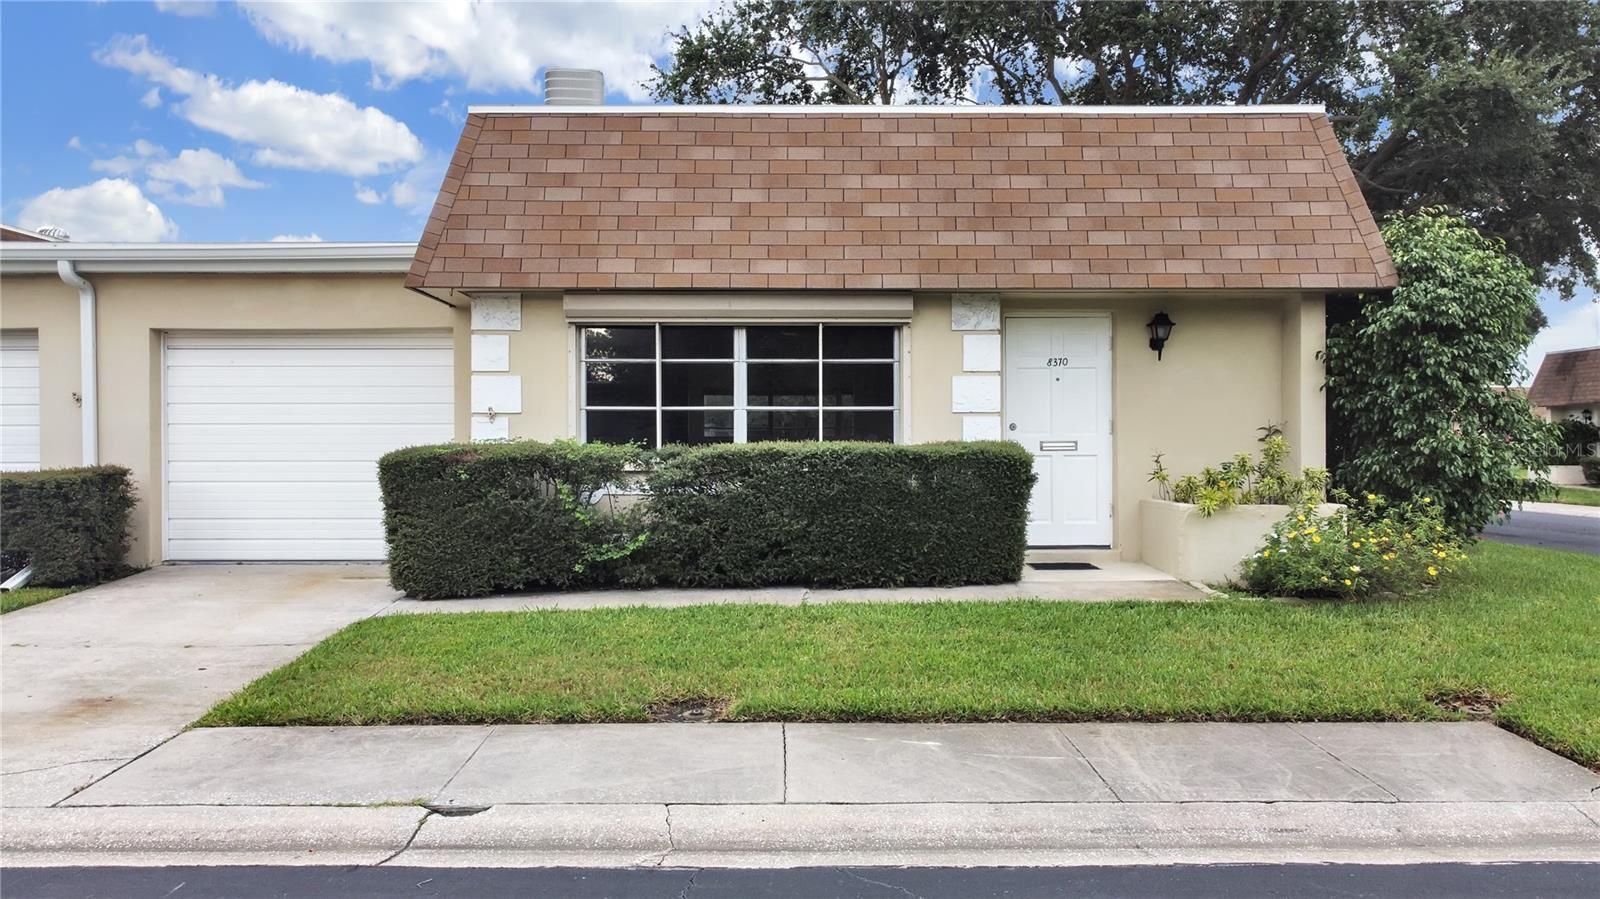 8370 BURGUNDY DRIVE N #3, Pinellas Park, FL 33781 - MLS#: T3330216